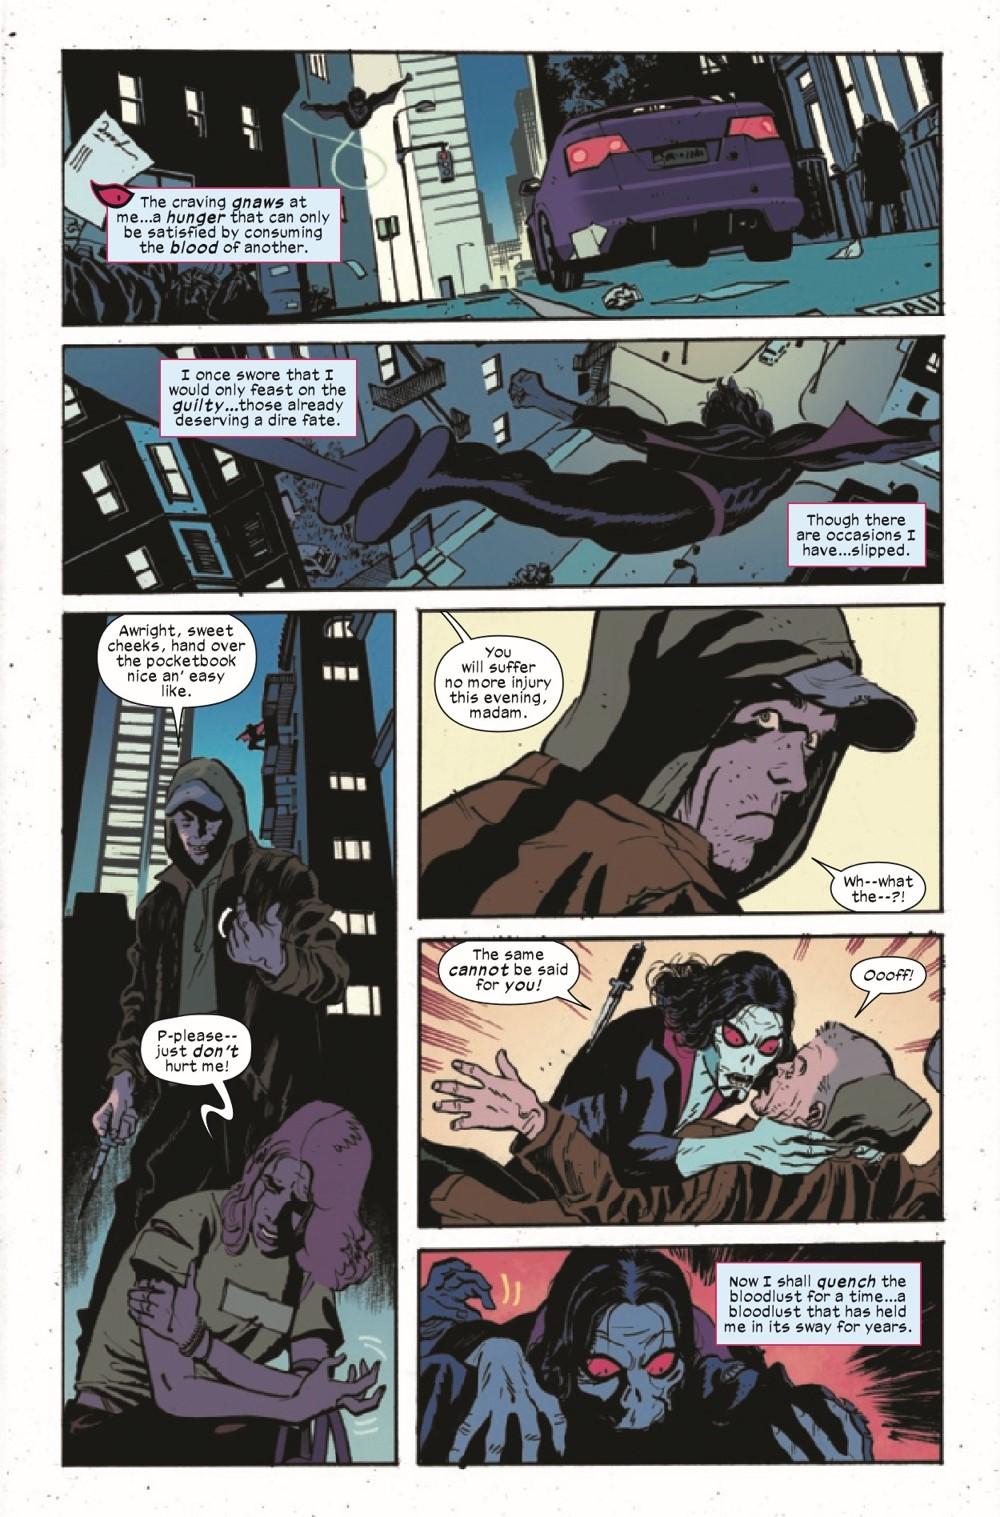 MORBIUSBOB2021001_Preview-3 ComicList Previews: MORBIUS BOND OF BLOOD #1